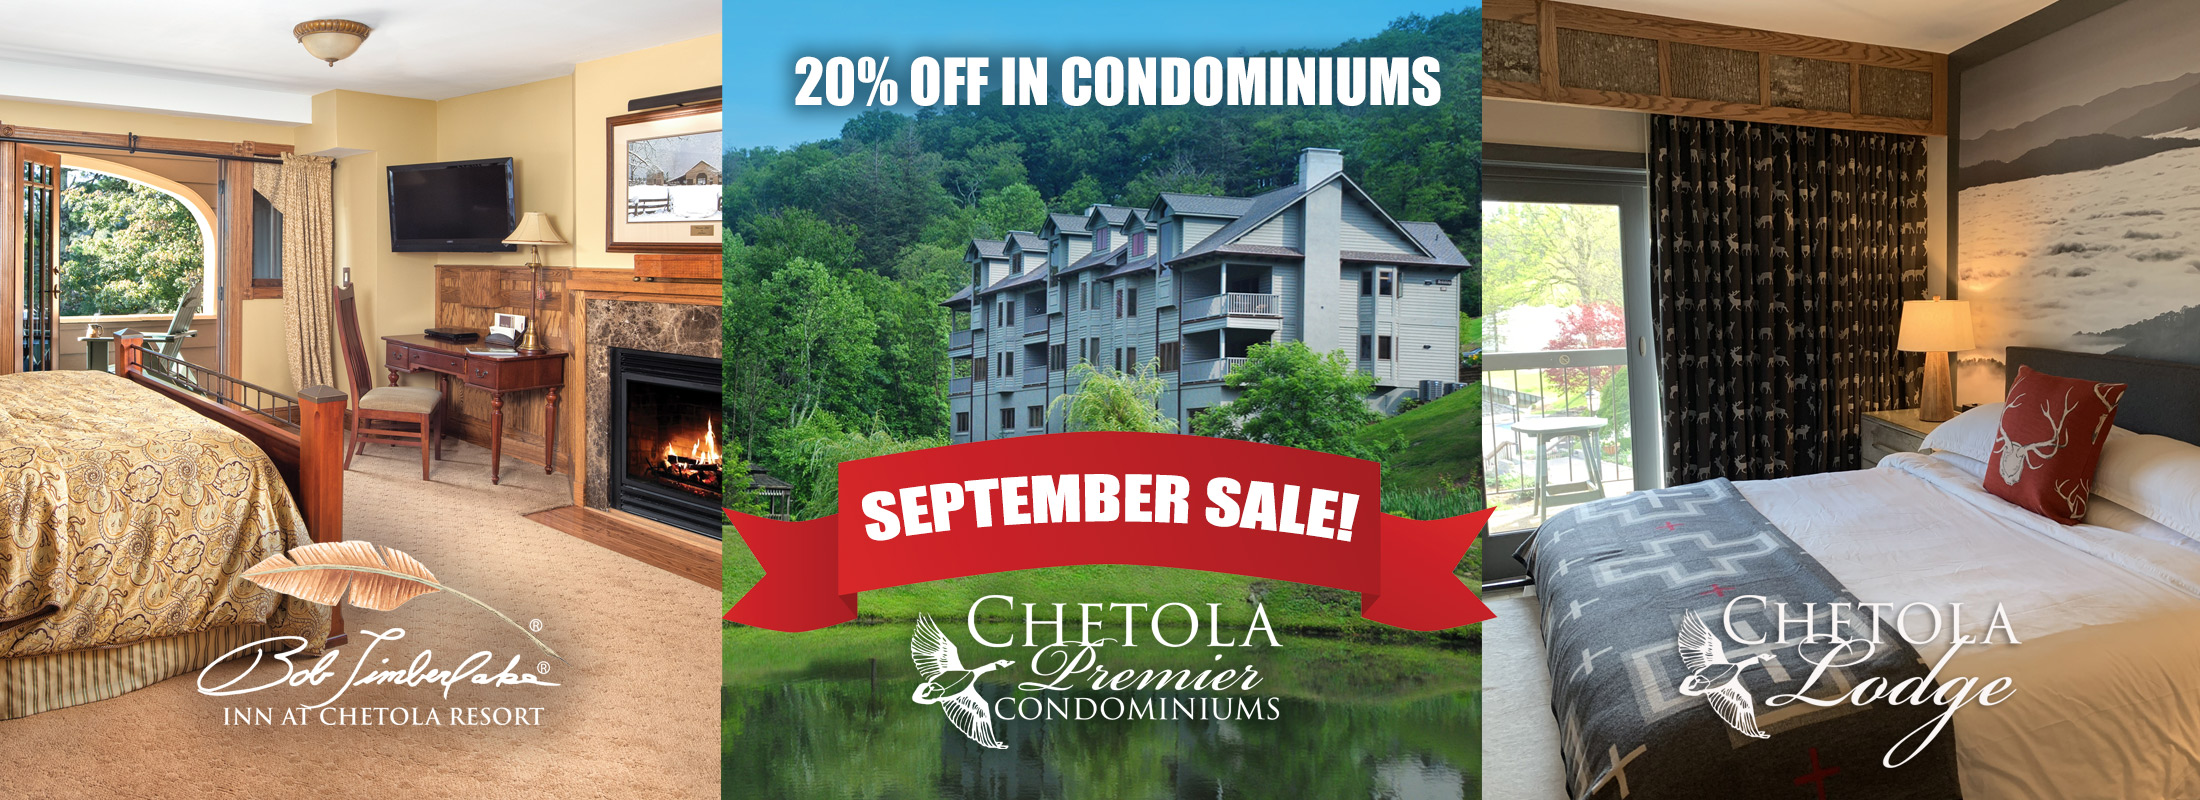 bob timberlake inn, chetola lodge and chetola condominiums